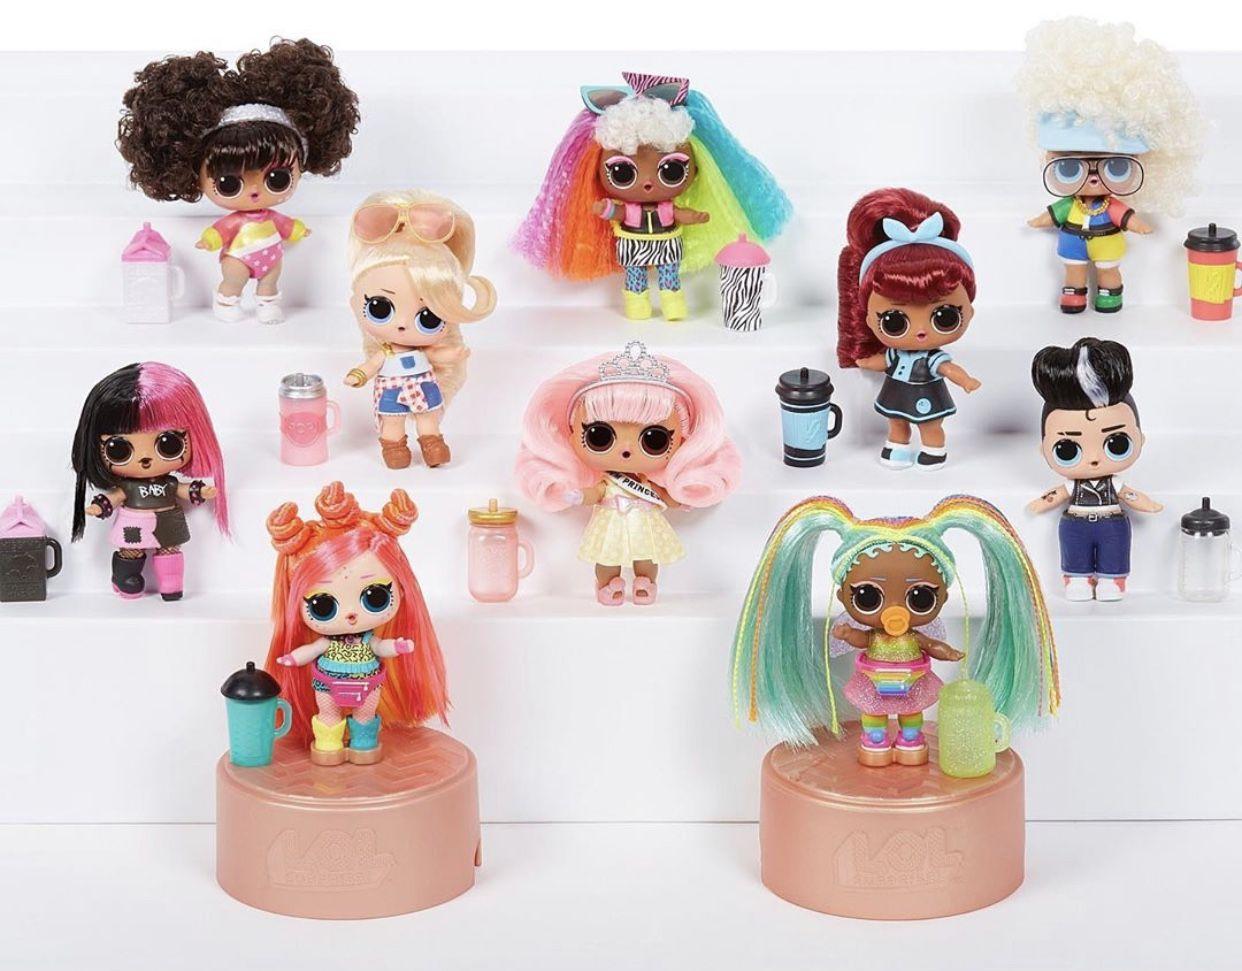 Color Change LOL Surprise Doll HairGoals Splatters Artist Doll Makeover Toy RARE